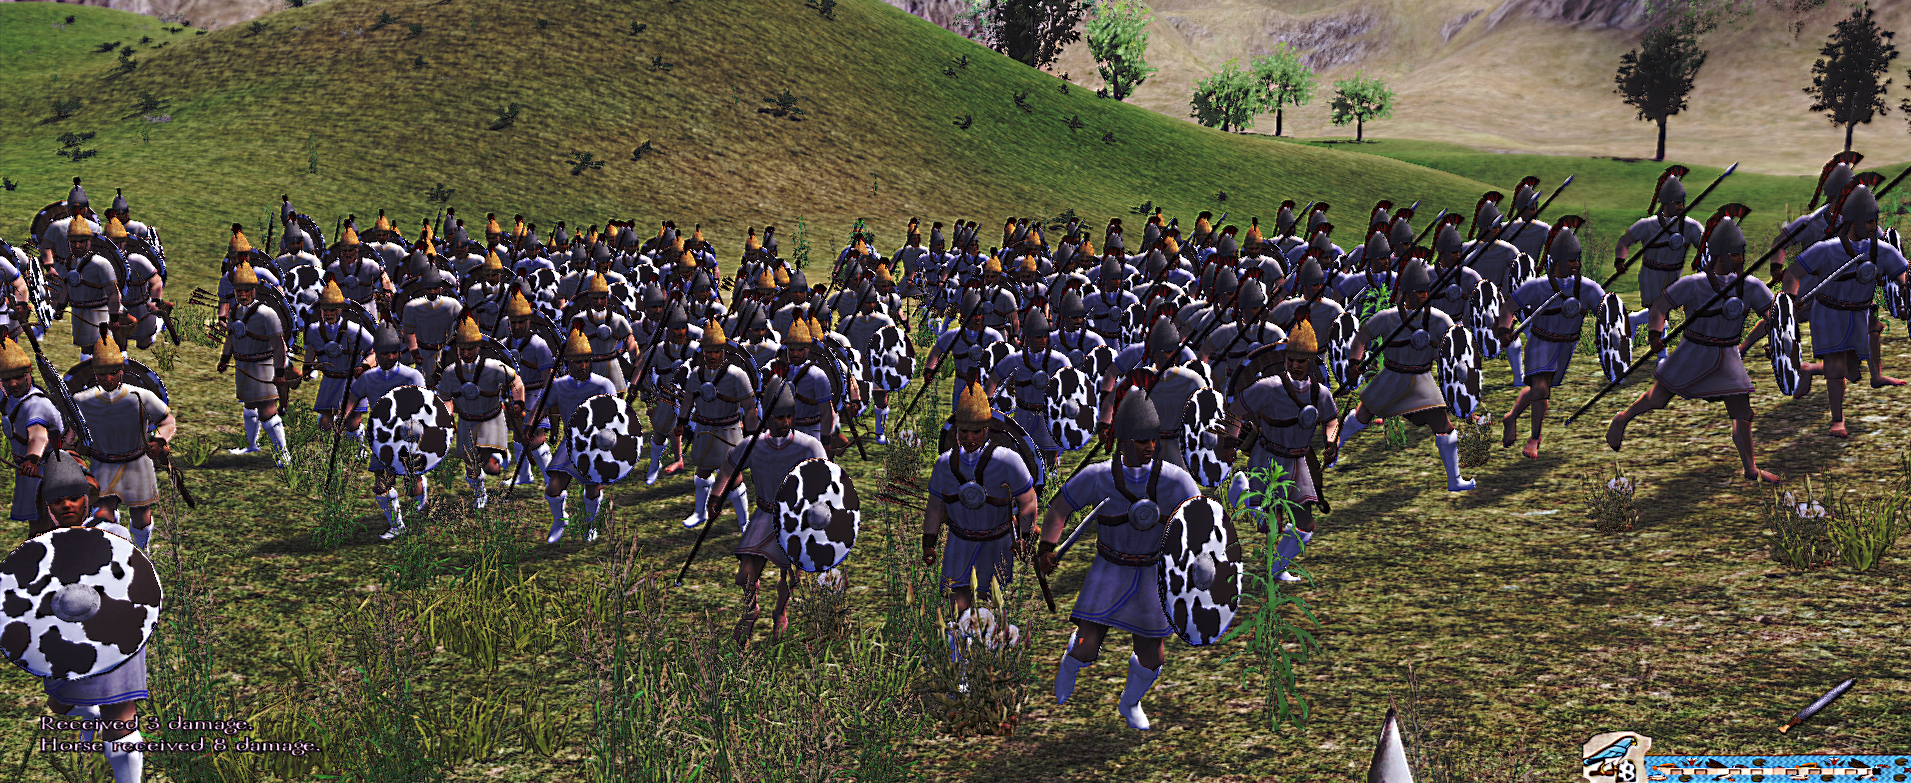 Neo Hittite armyoutlaws